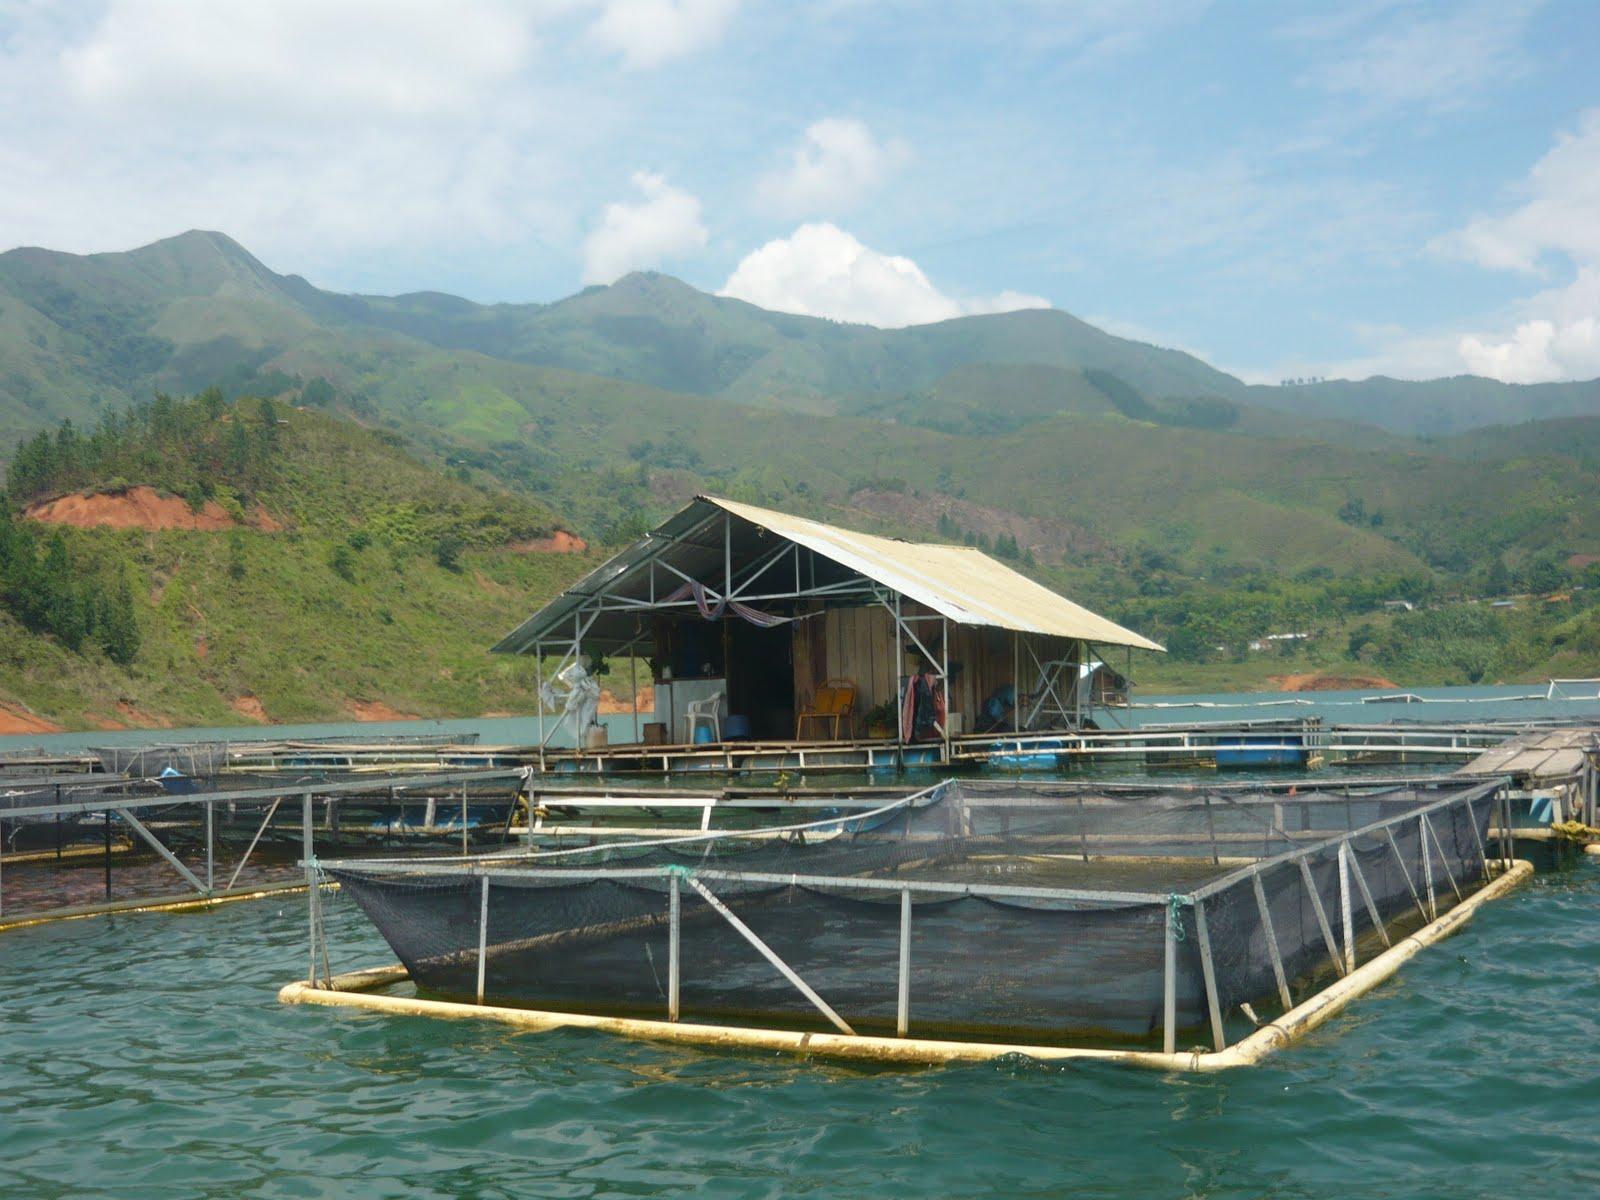 Visita embalse la salvajina parametros tecnicos for Jaulas flotantes para piscicultura